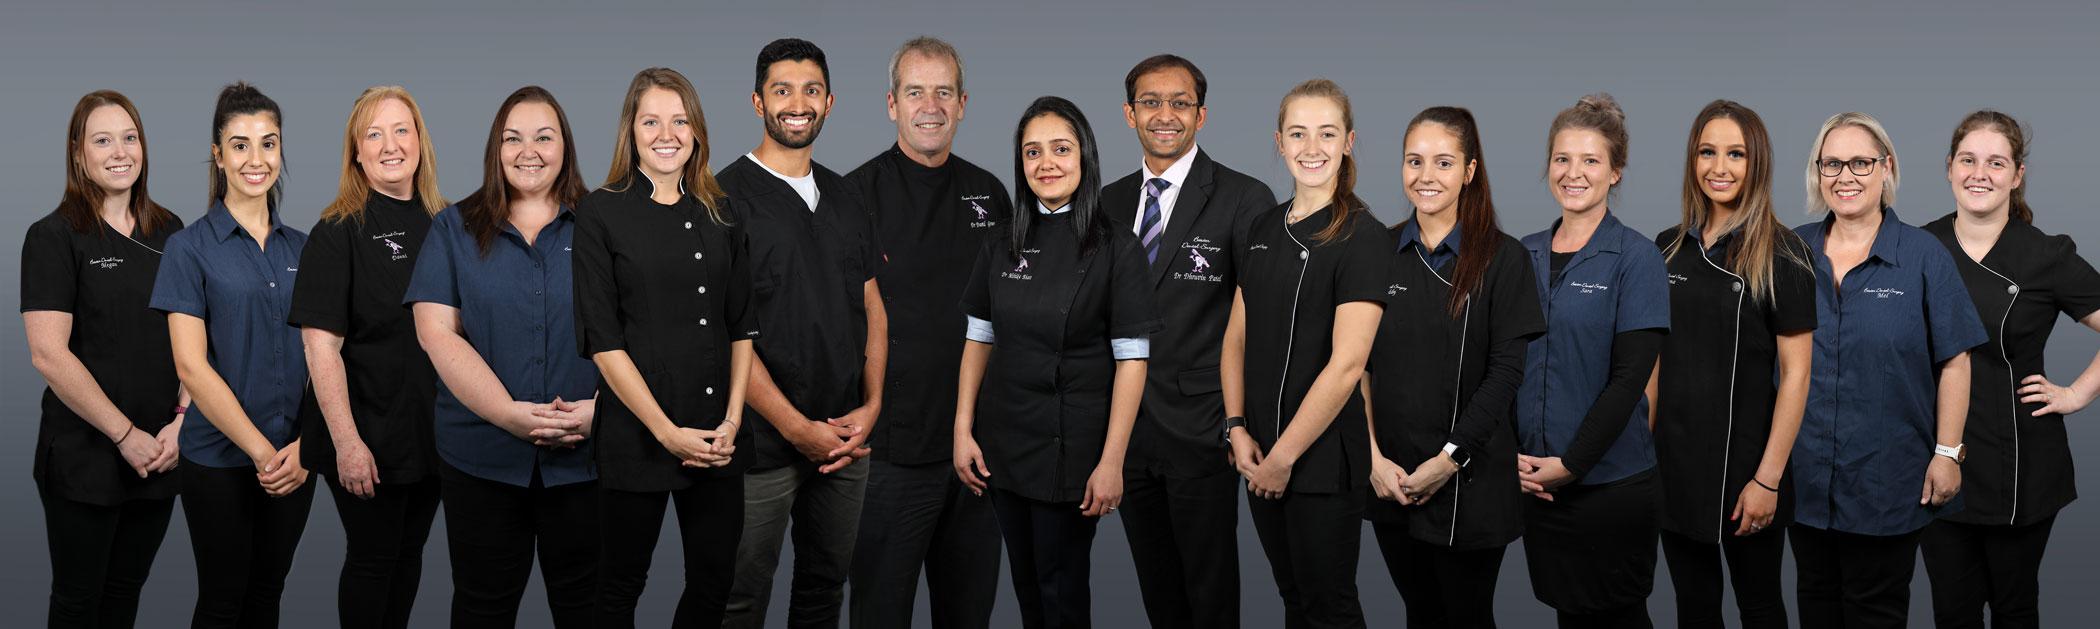 Meet Baxer Dental Team at Mornington-Peninsula